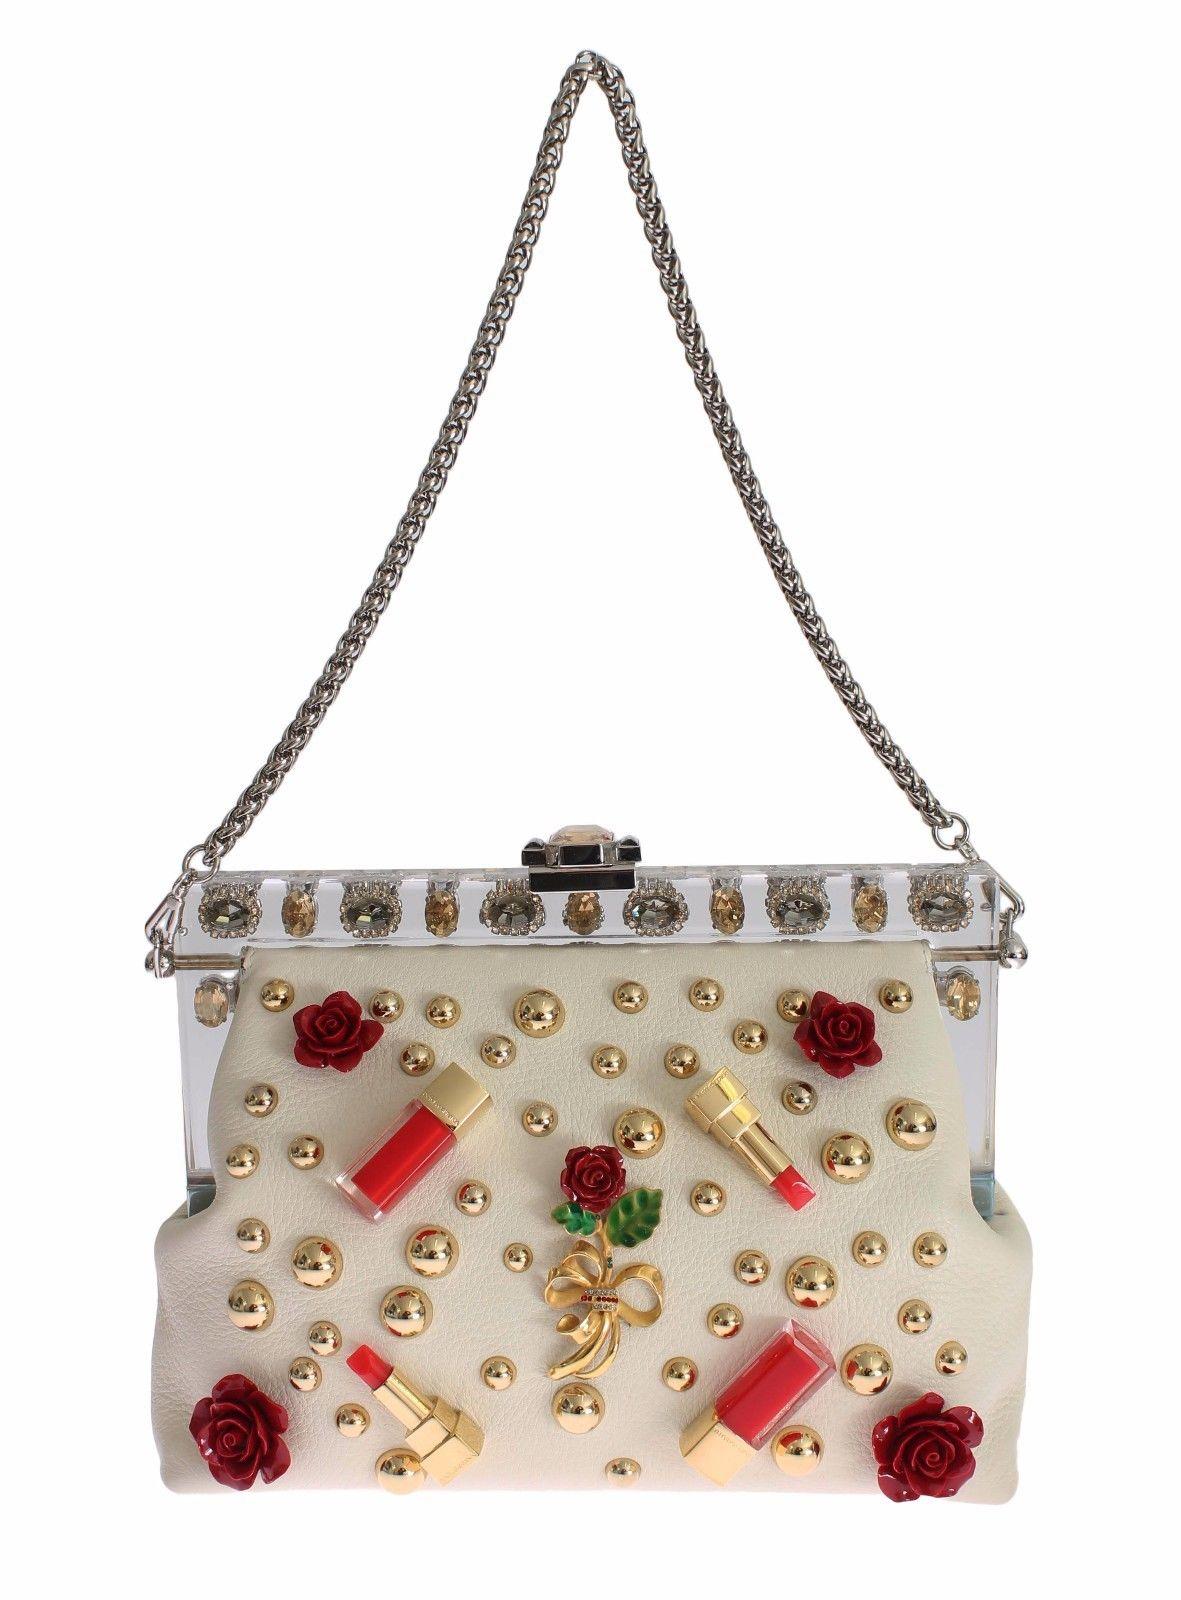 037f821a421e Purse VANDA Beige Leather Crystal Lipstick Roses. Dolce   Gabbana